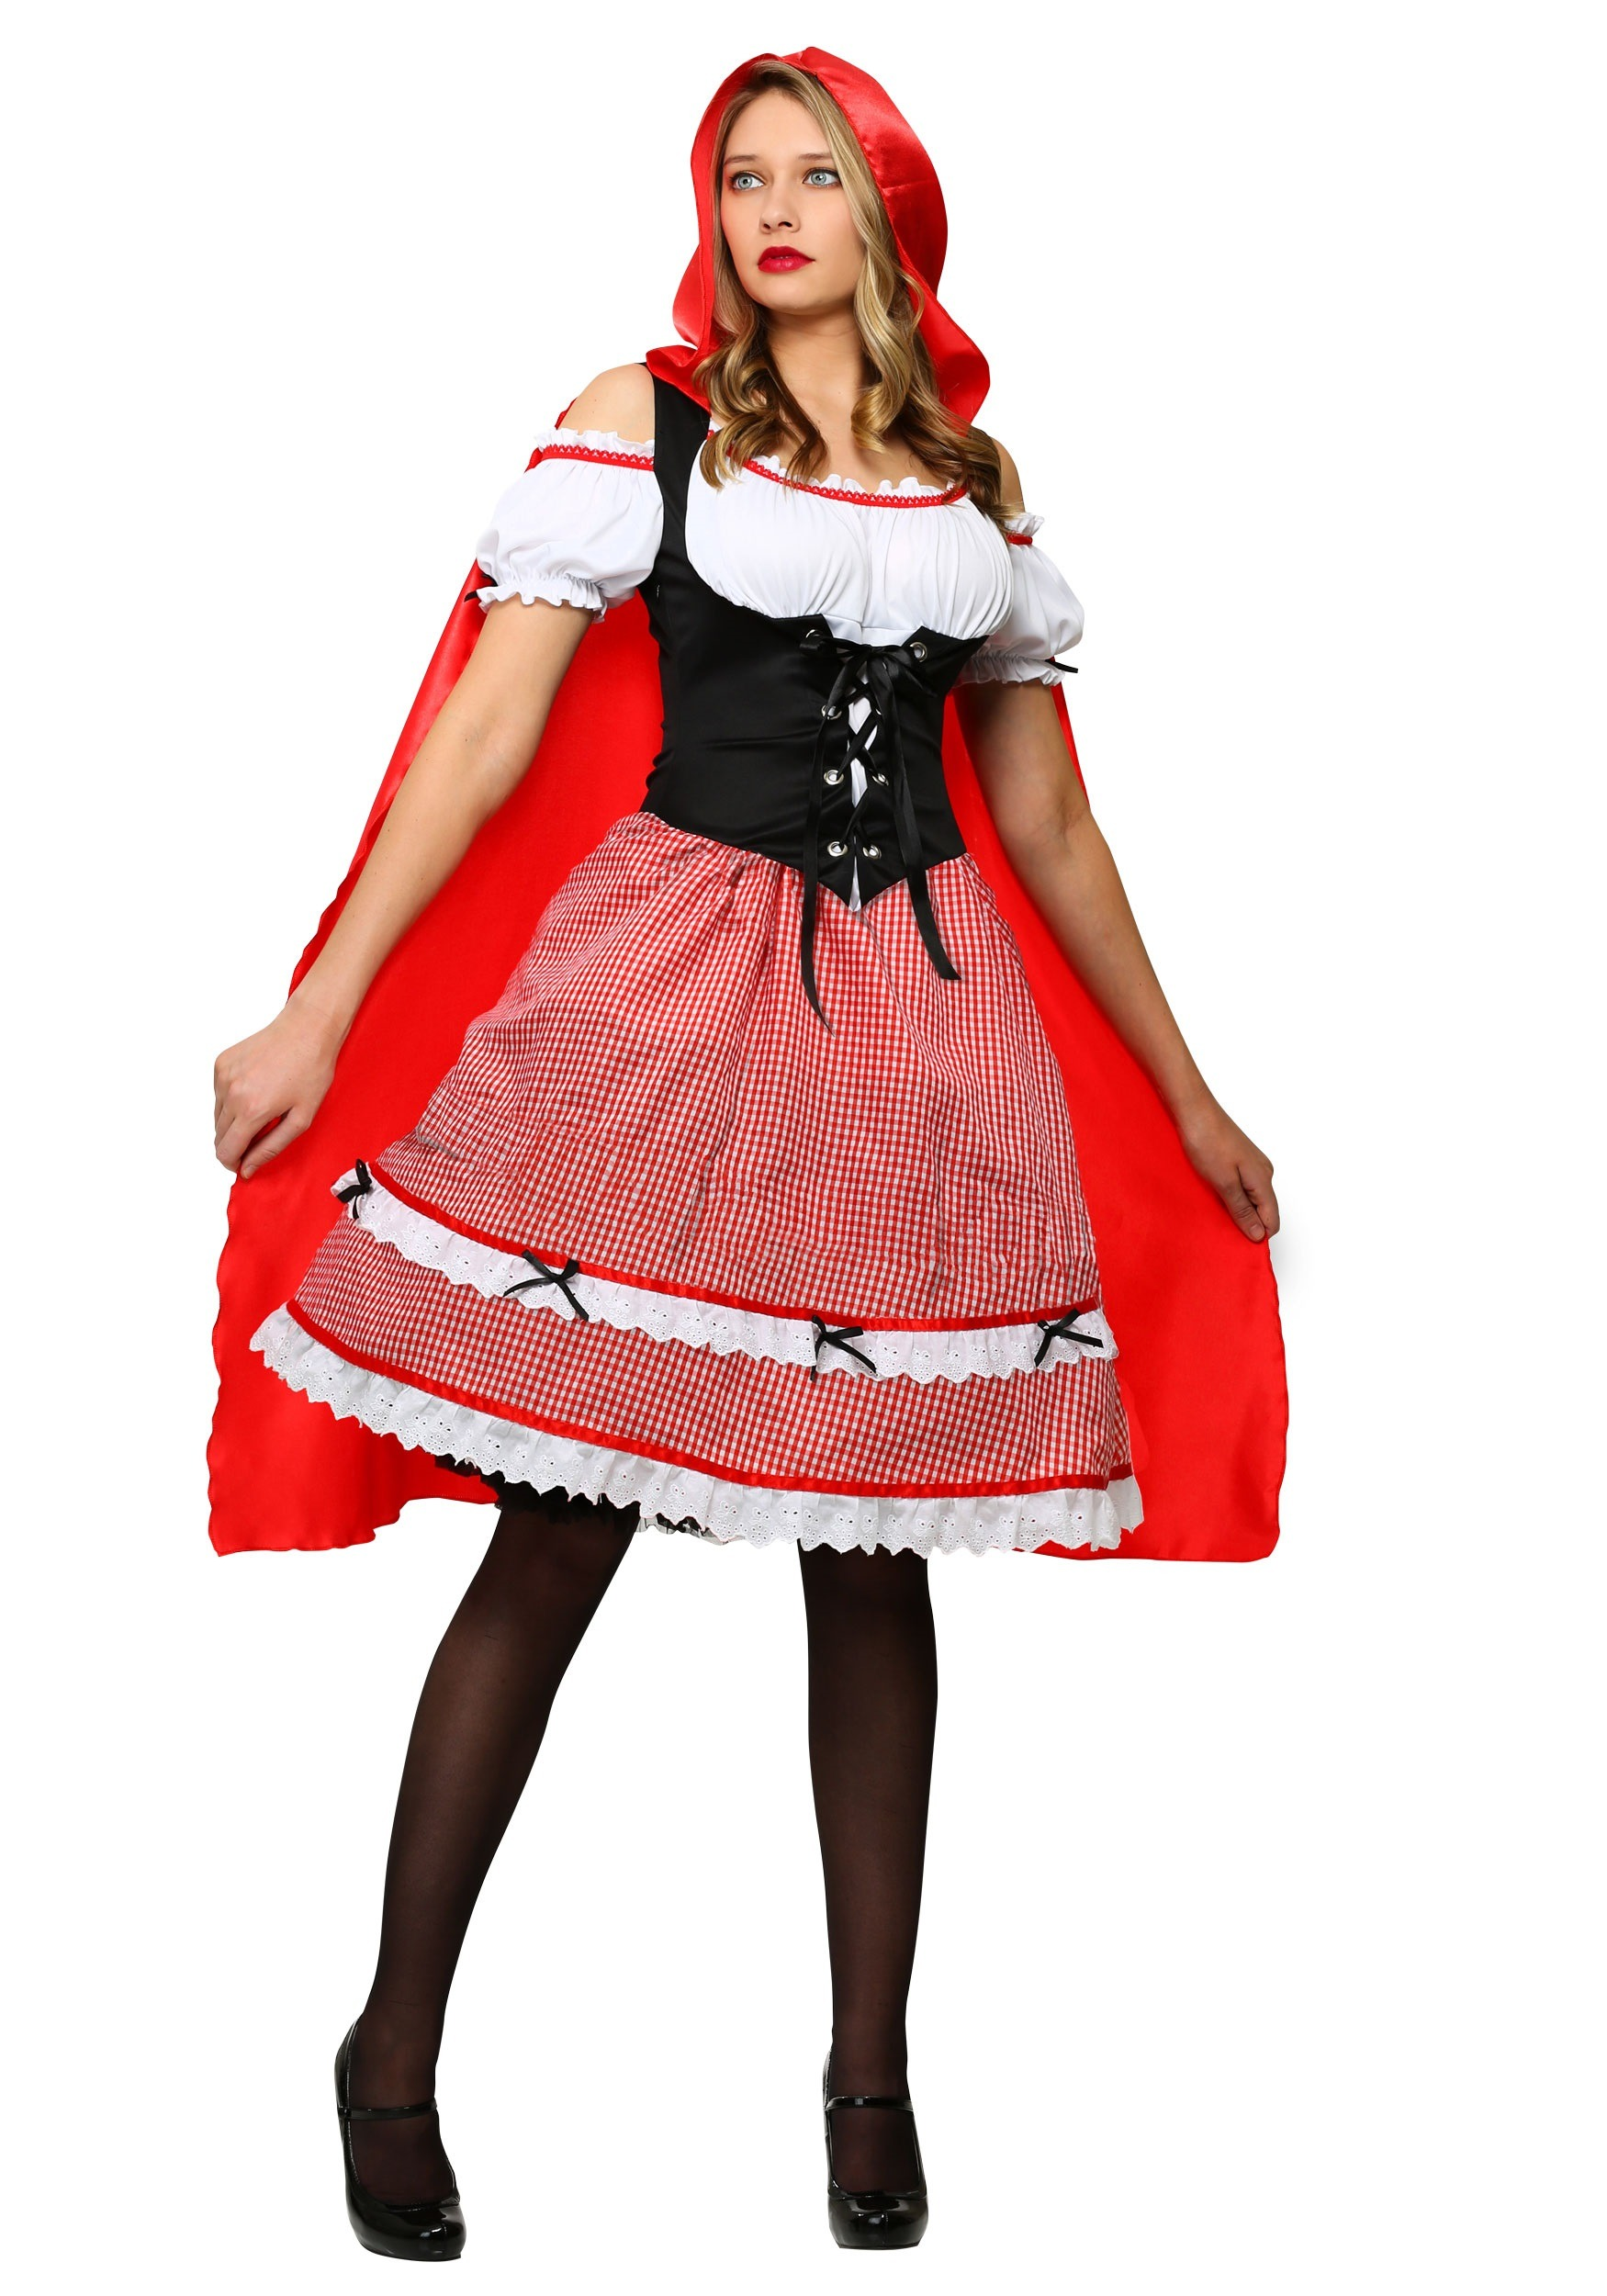 Women's Red Riding Hood Knee Length Dress Costume